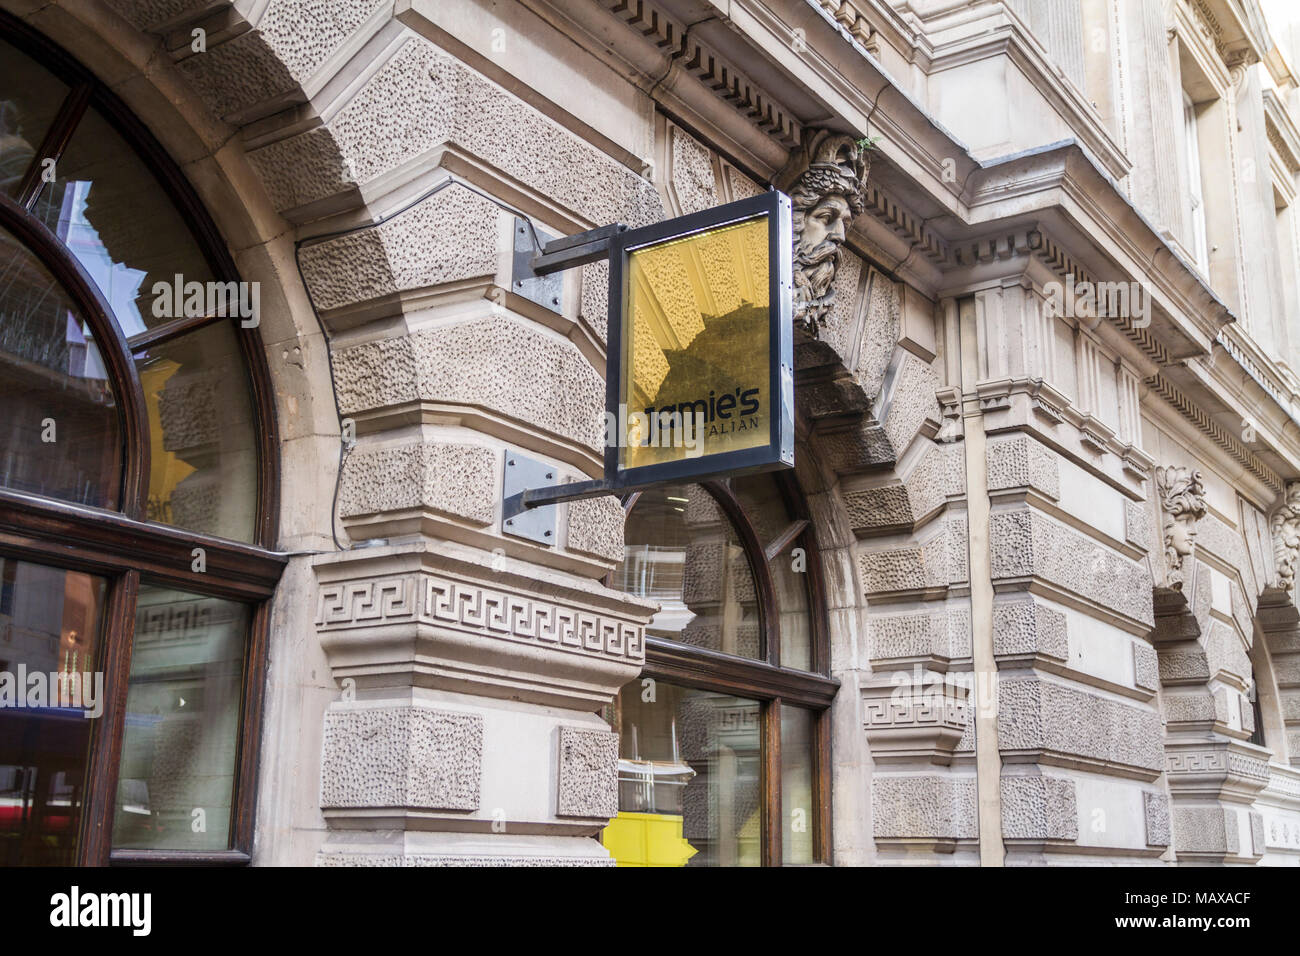 Jamie Olivers Restauant, Jamie's Italian Restaurant Threadneedle Street City Of London UK Stock Photo